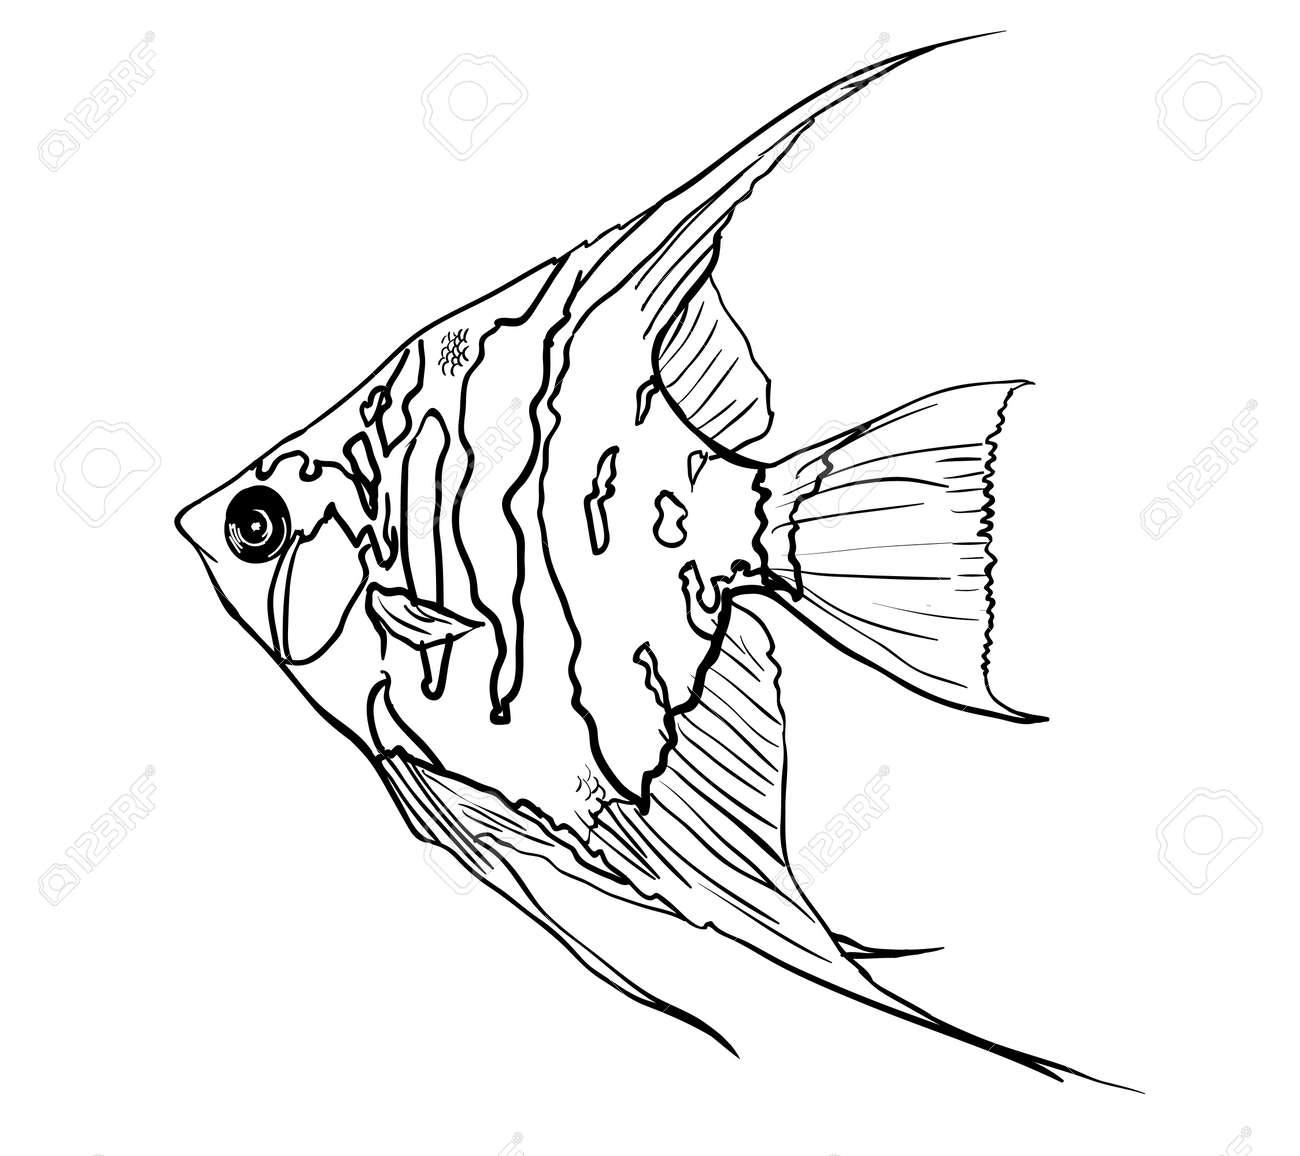 Angel fish,Pterophyllum species originate from the Amazon Rive Stock Photo - 22224679